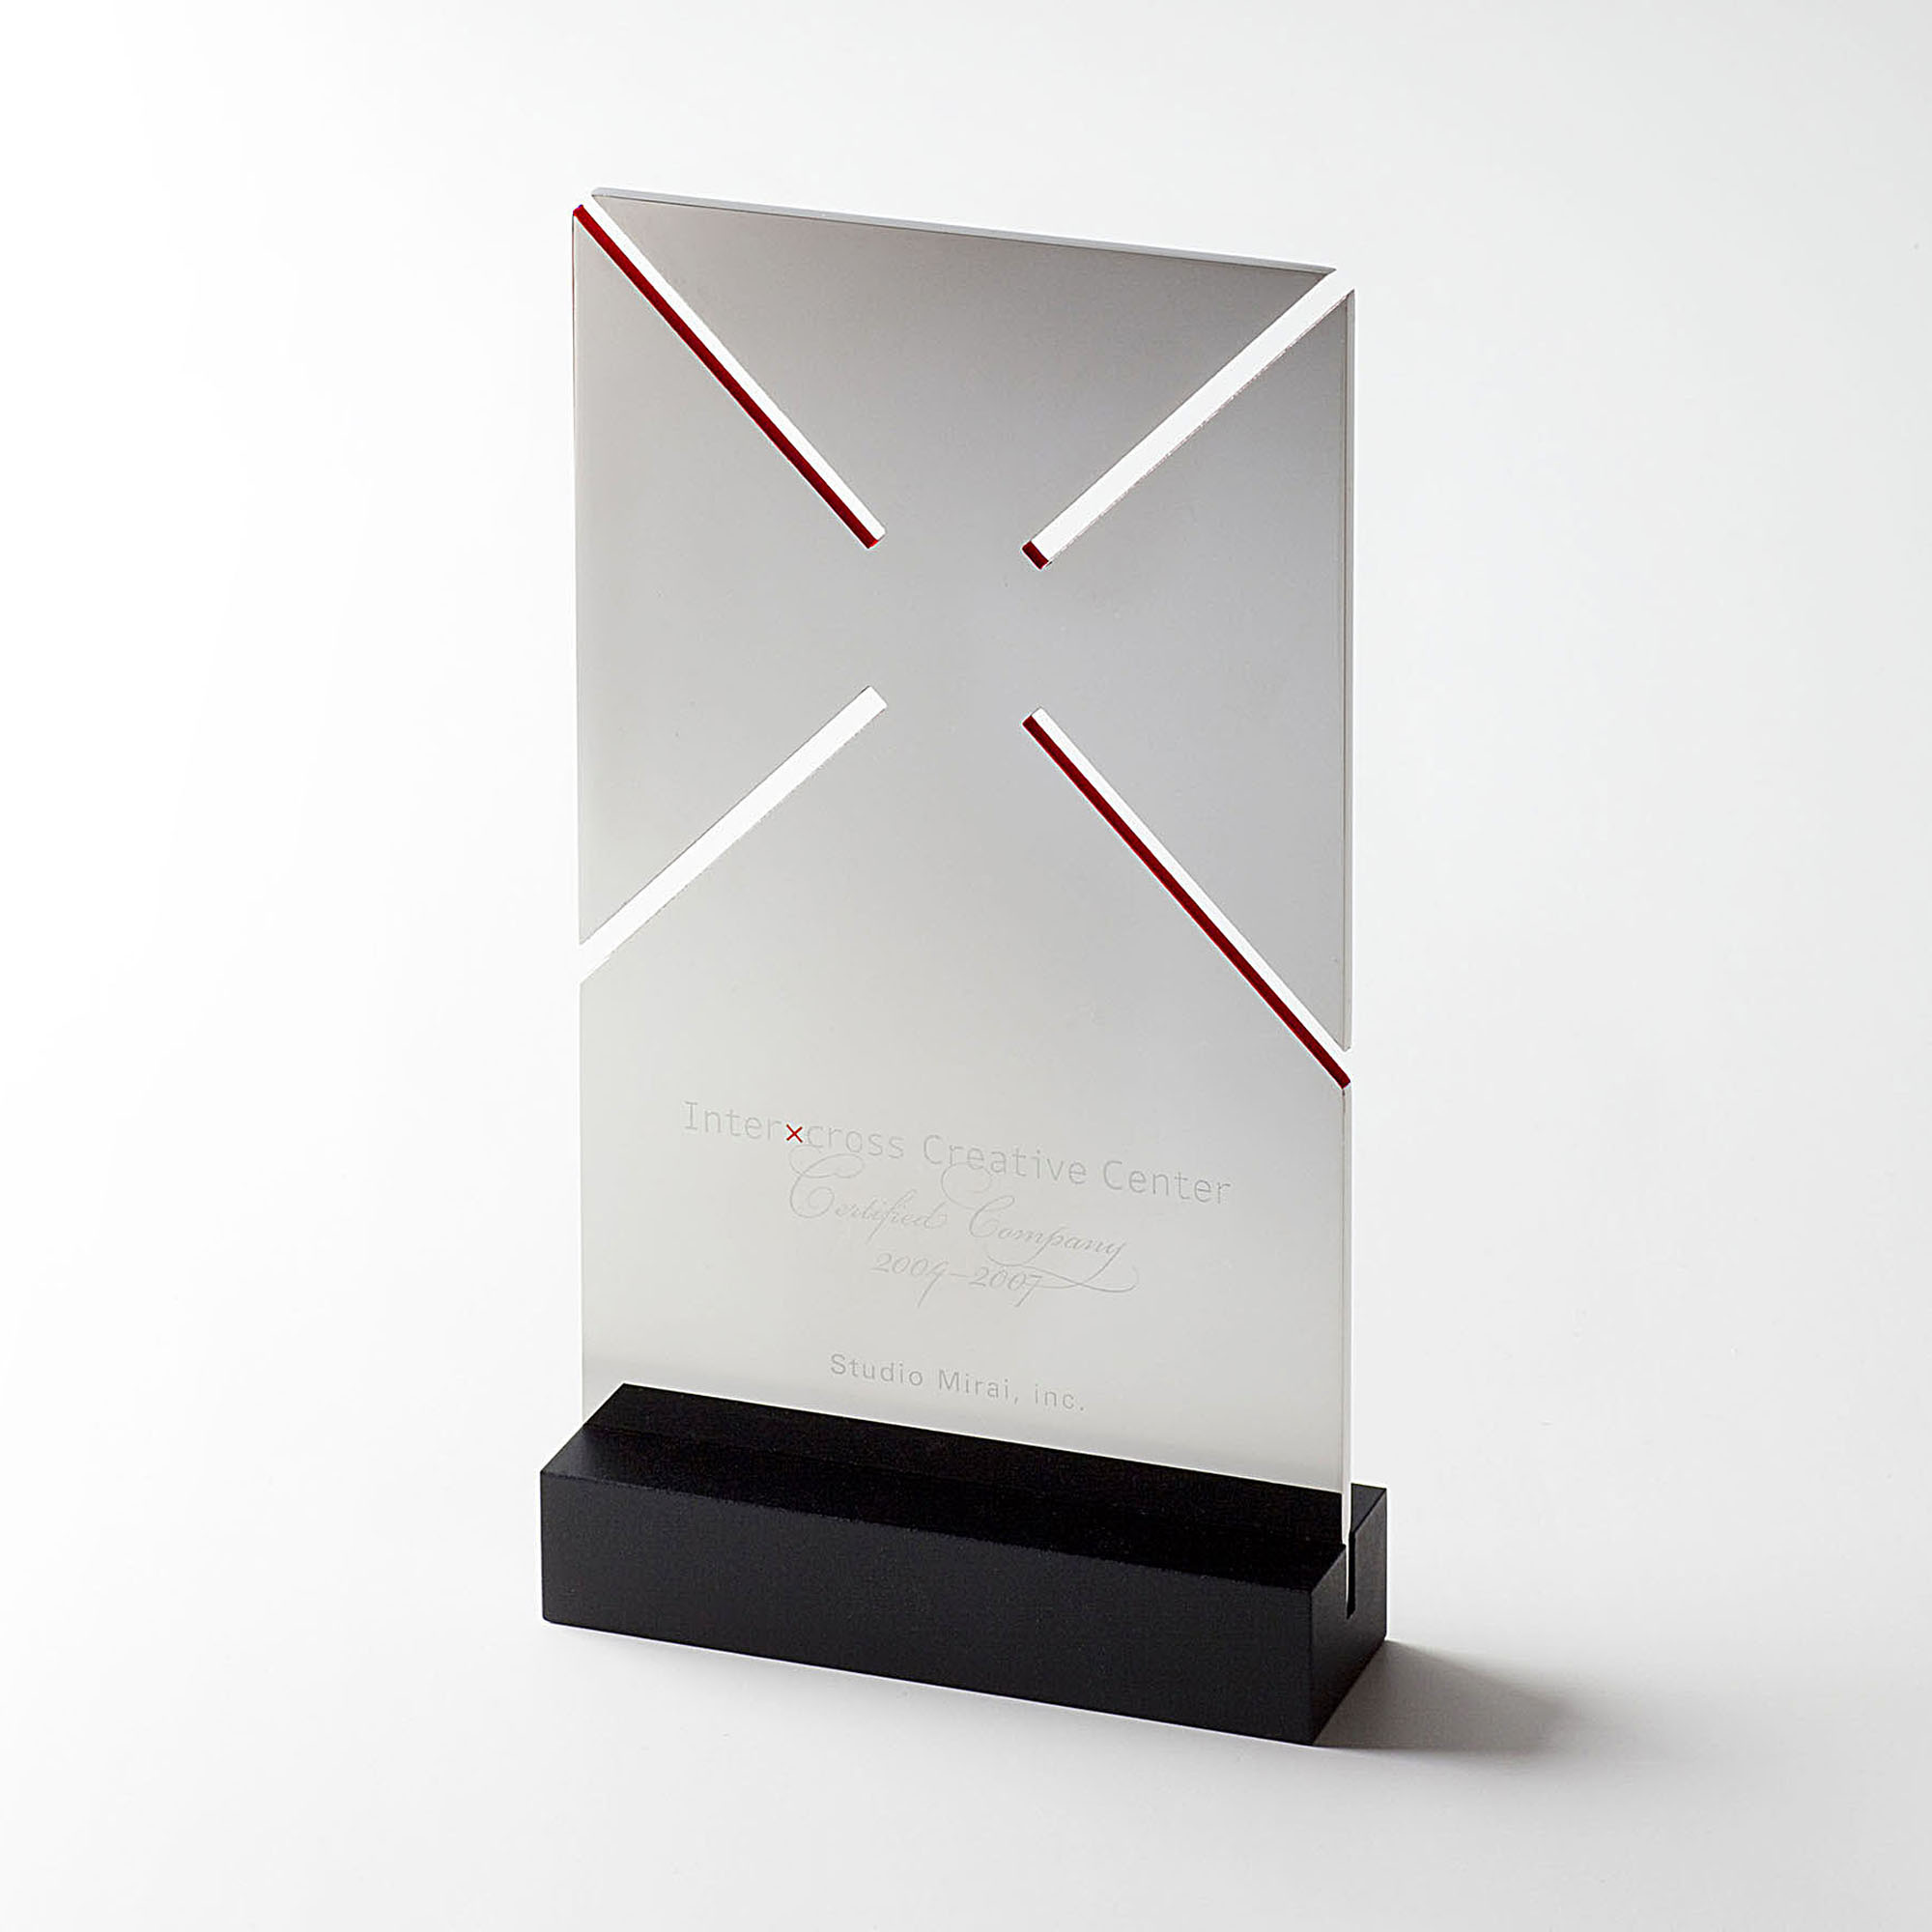 ICC Award 2007